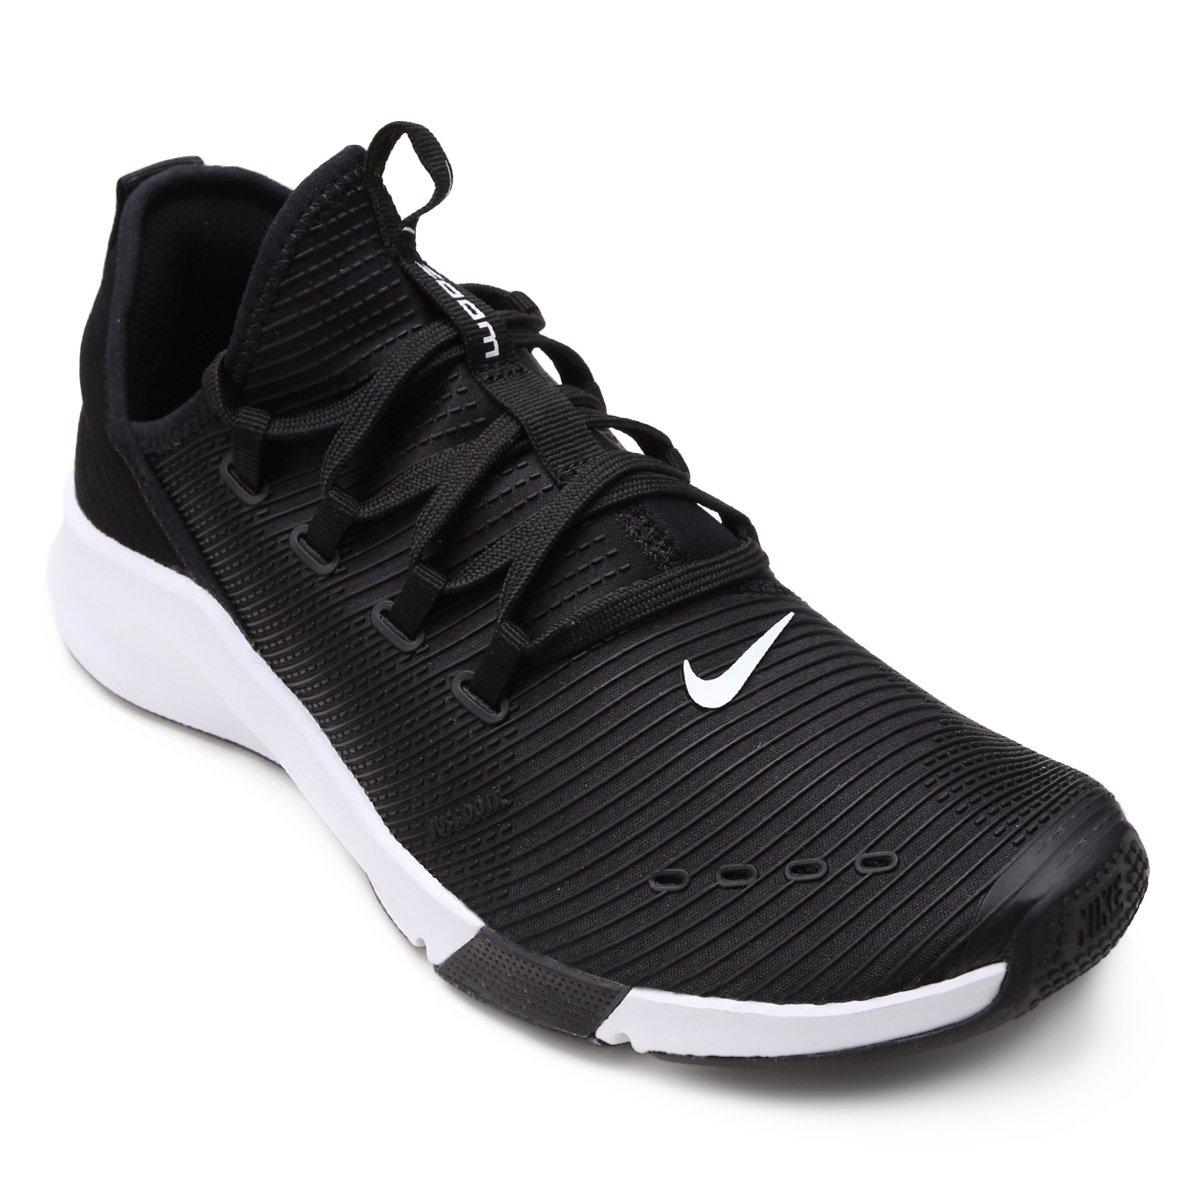 Tênis Nike Air Zoom 2 Elevate Feminino Preto E Branco